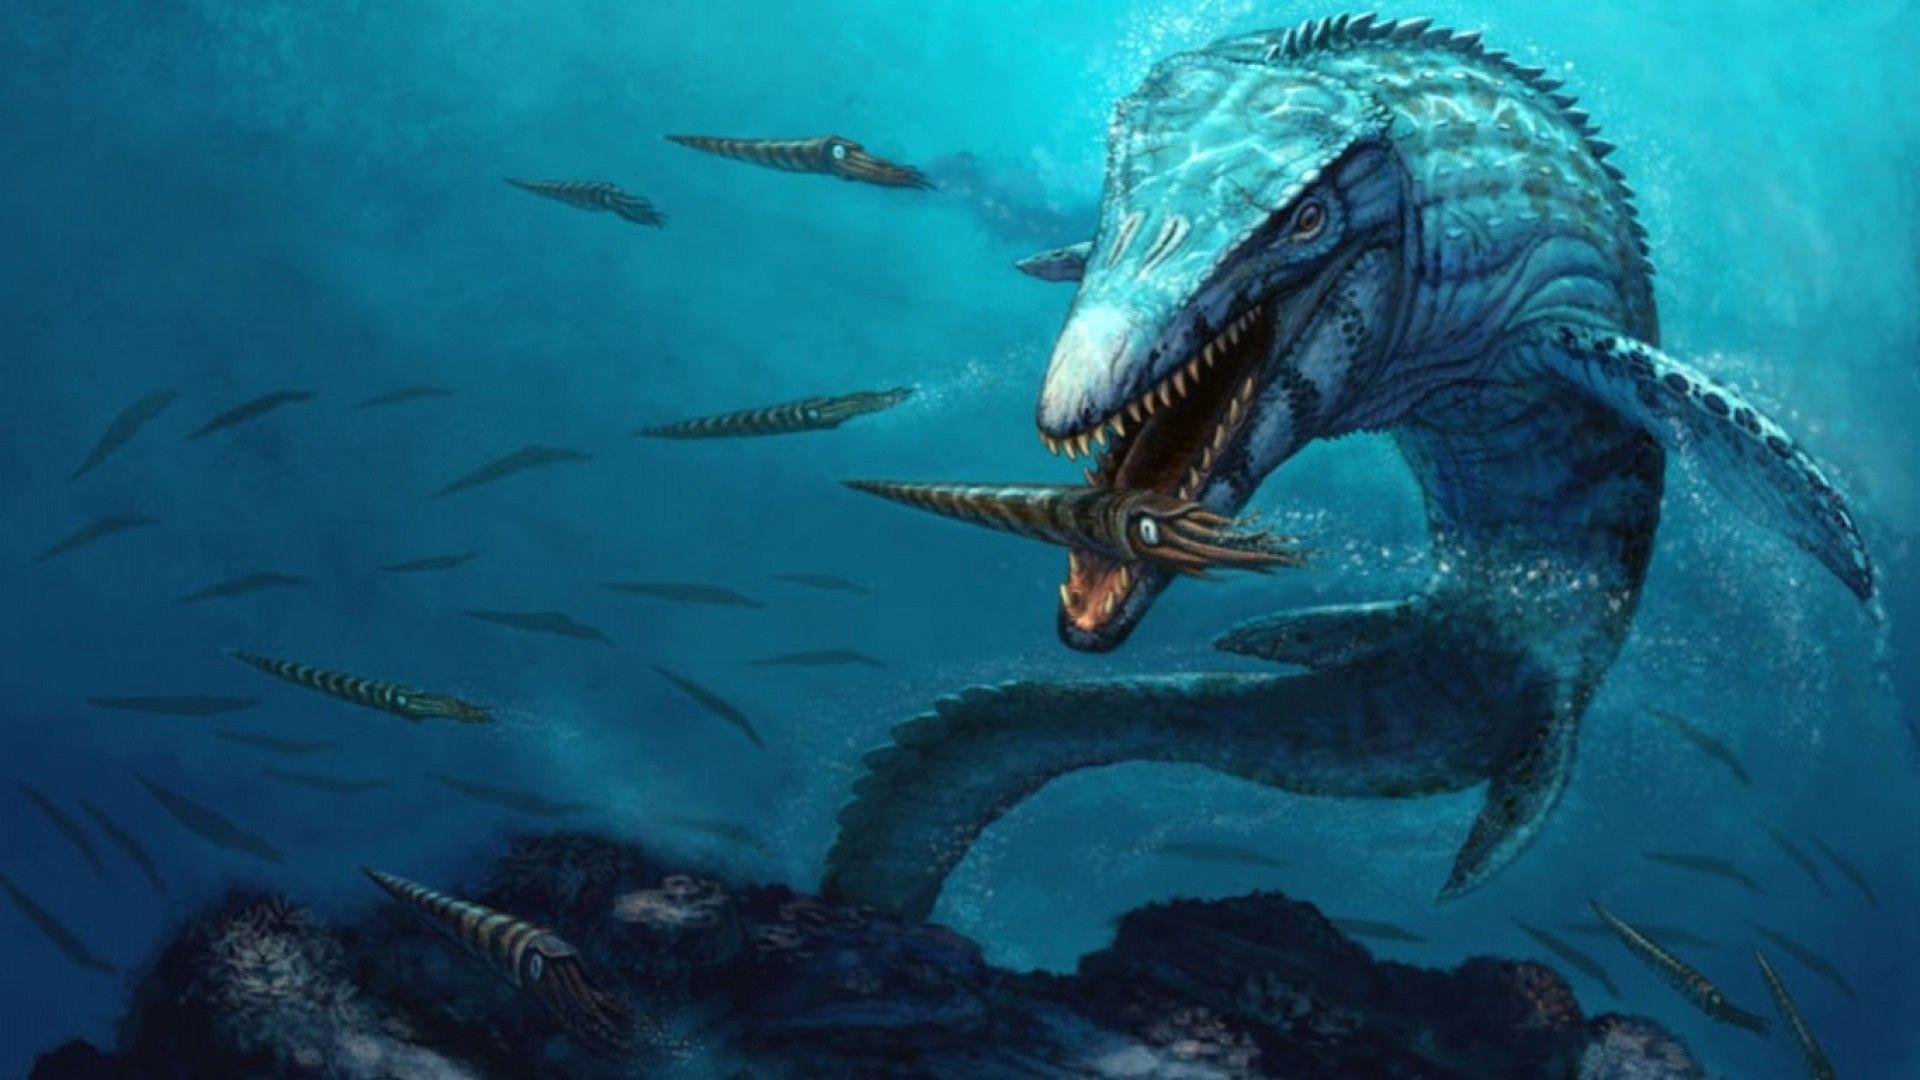 dinosaur images free download